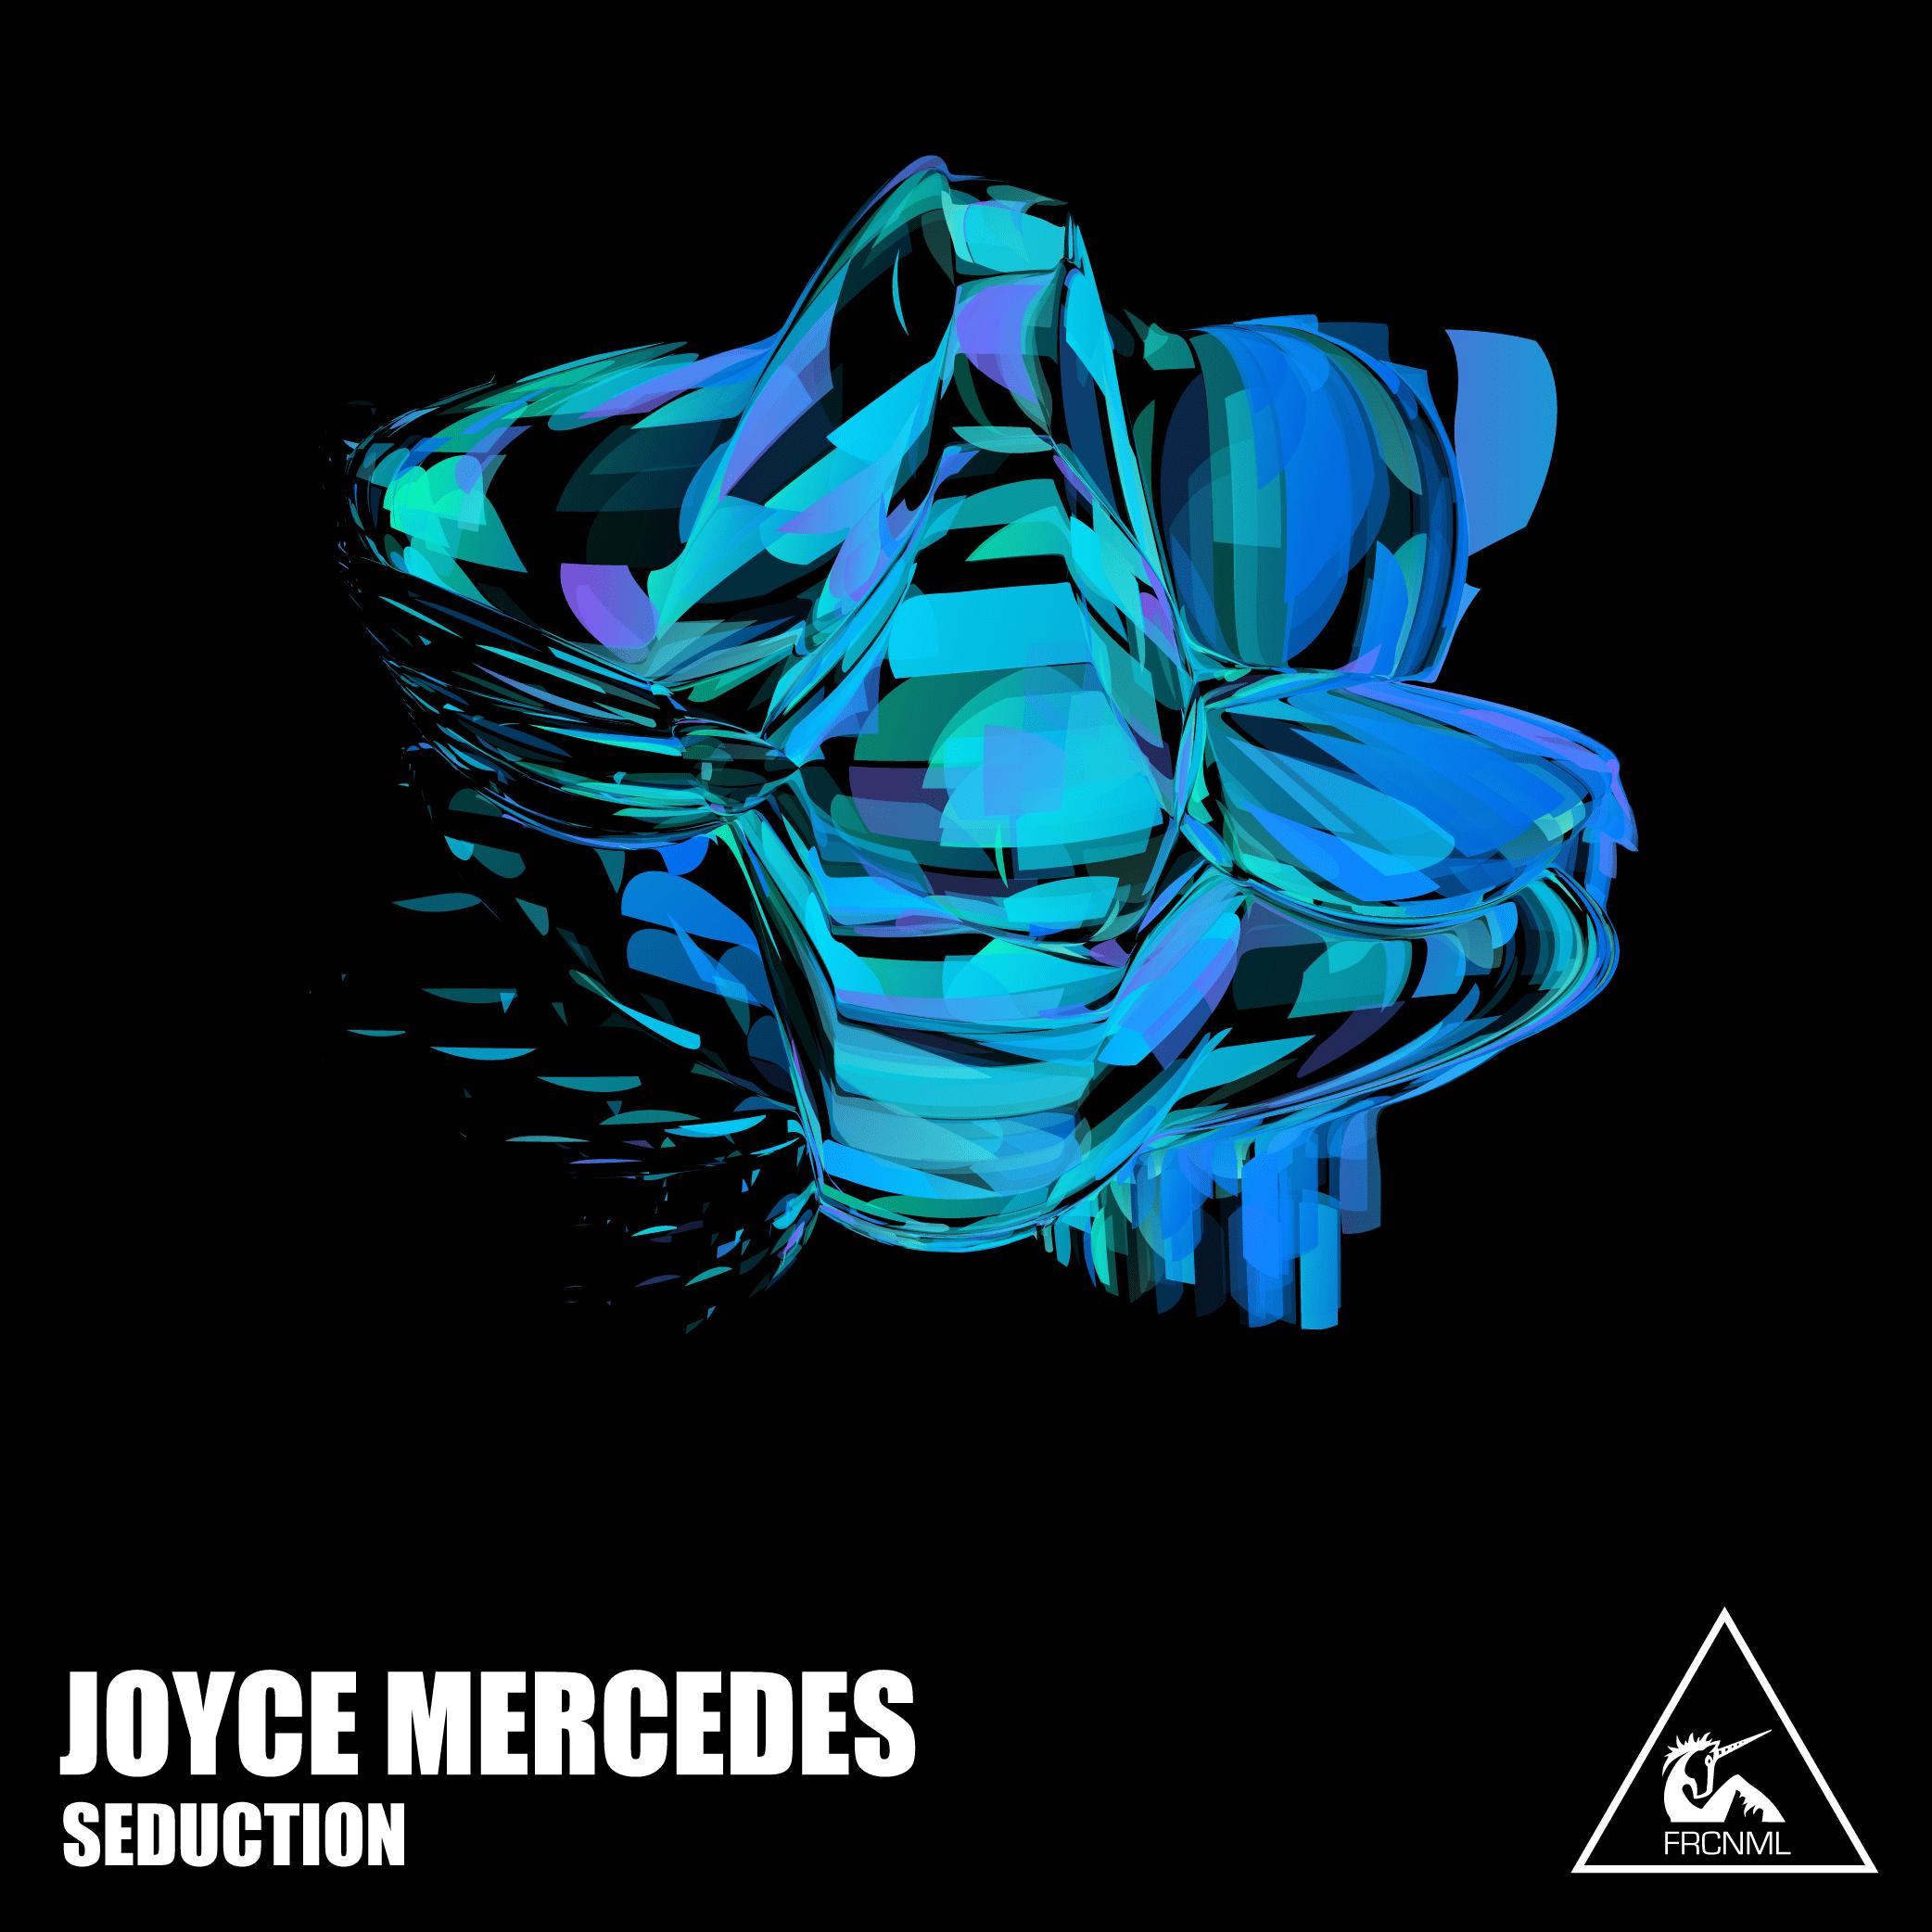 Joyce Mercedes Seduction